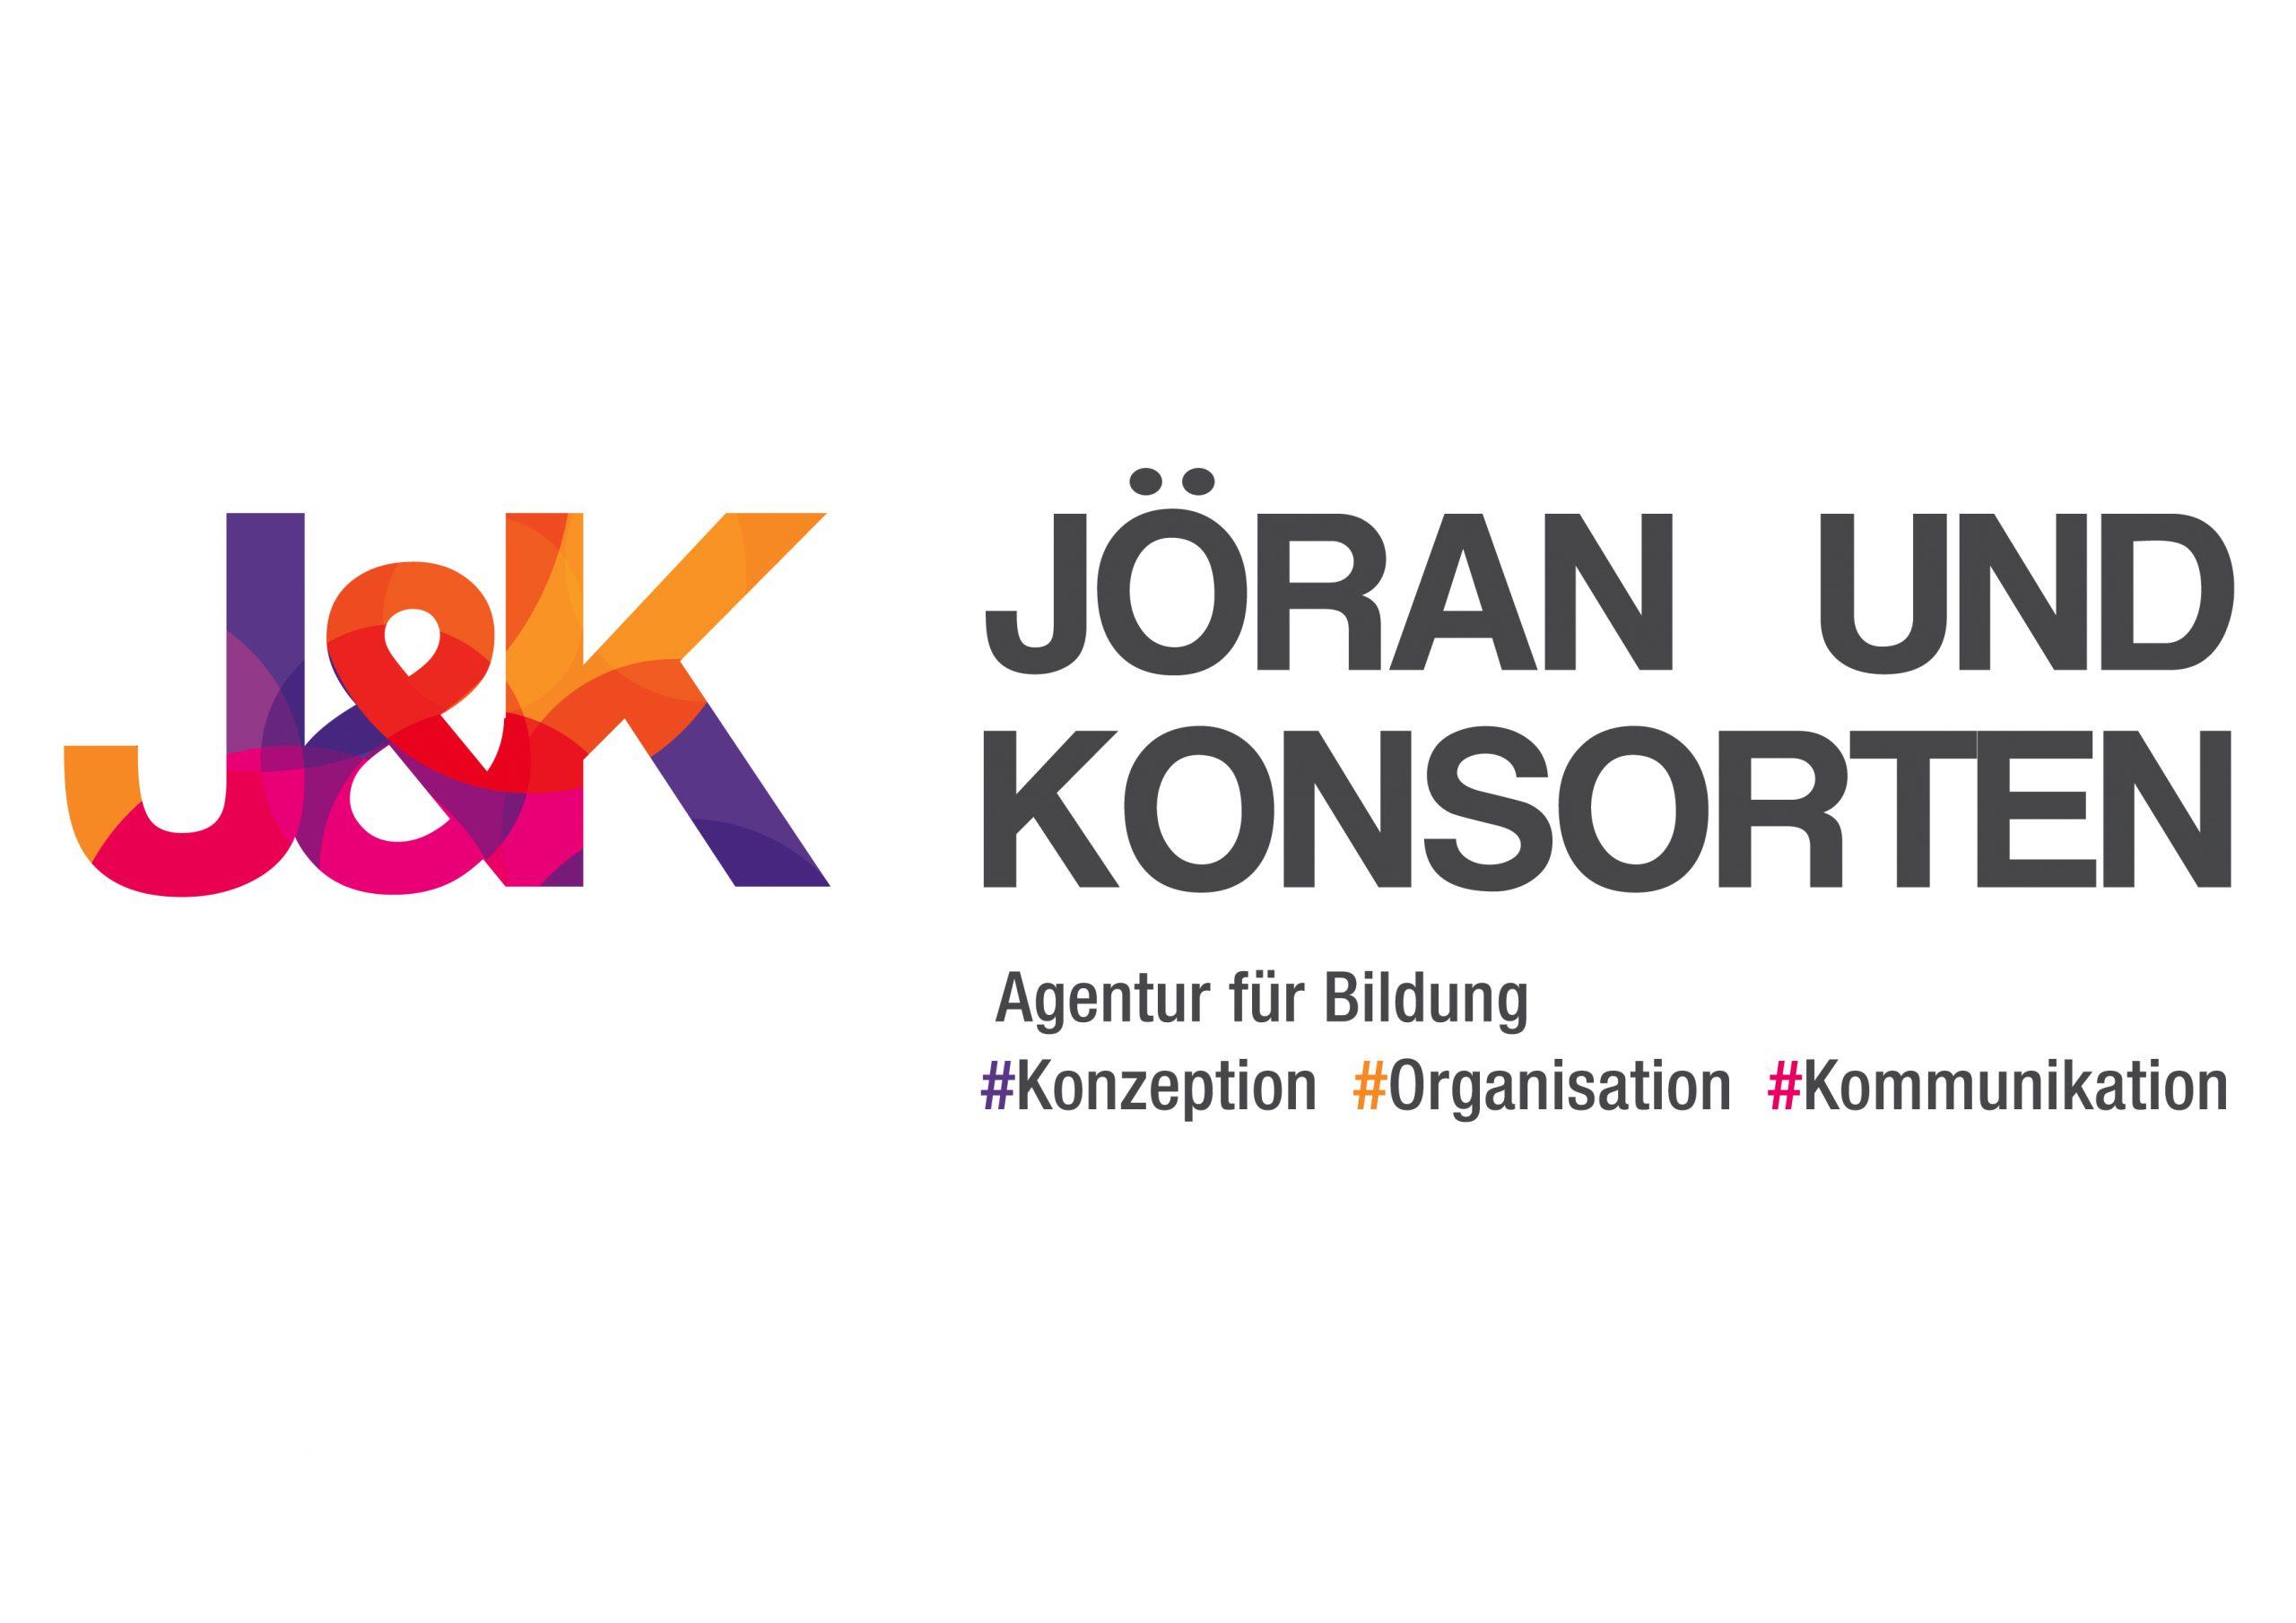 Logo: J&K – Jöran und Konsorten